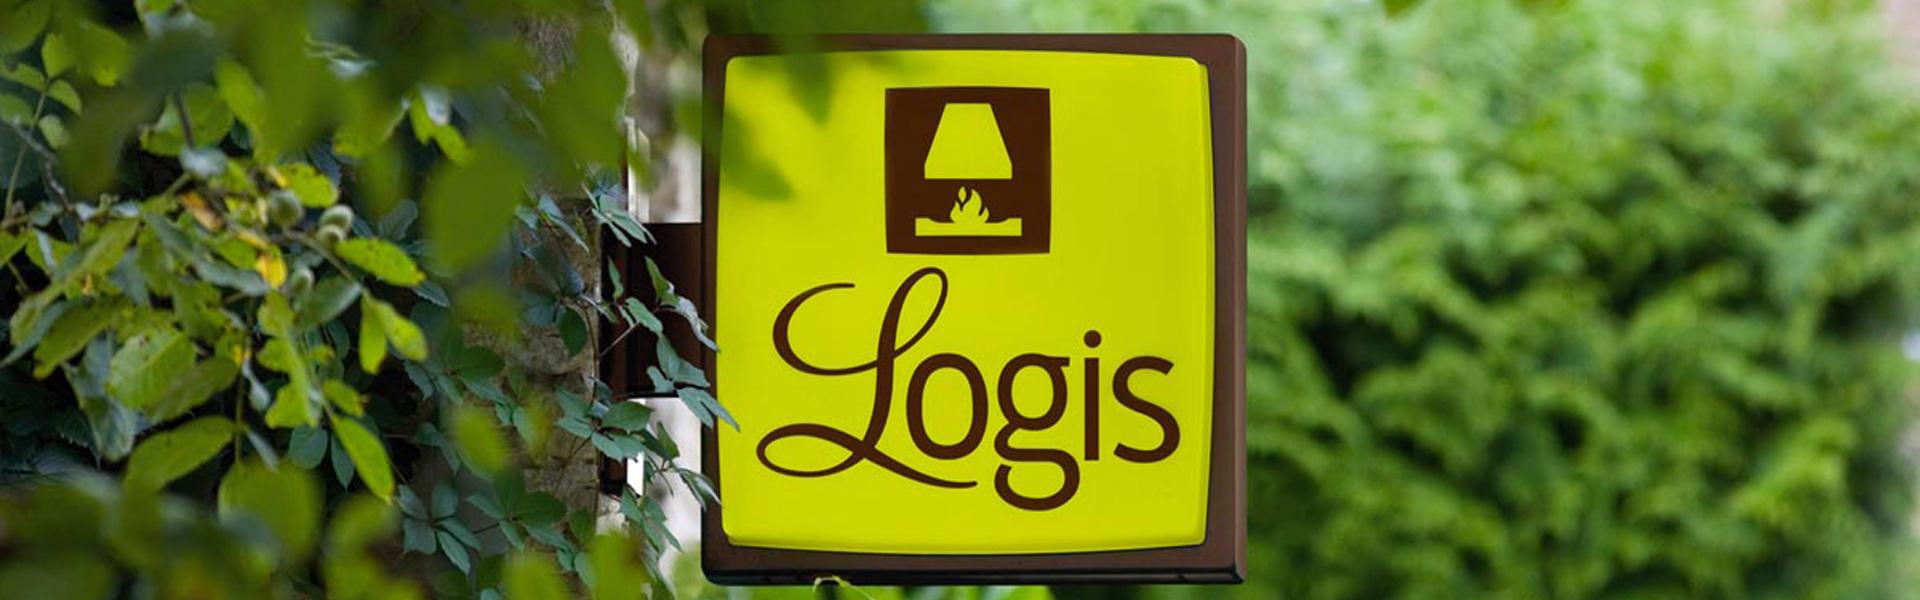 Logis Hotel Dimmer